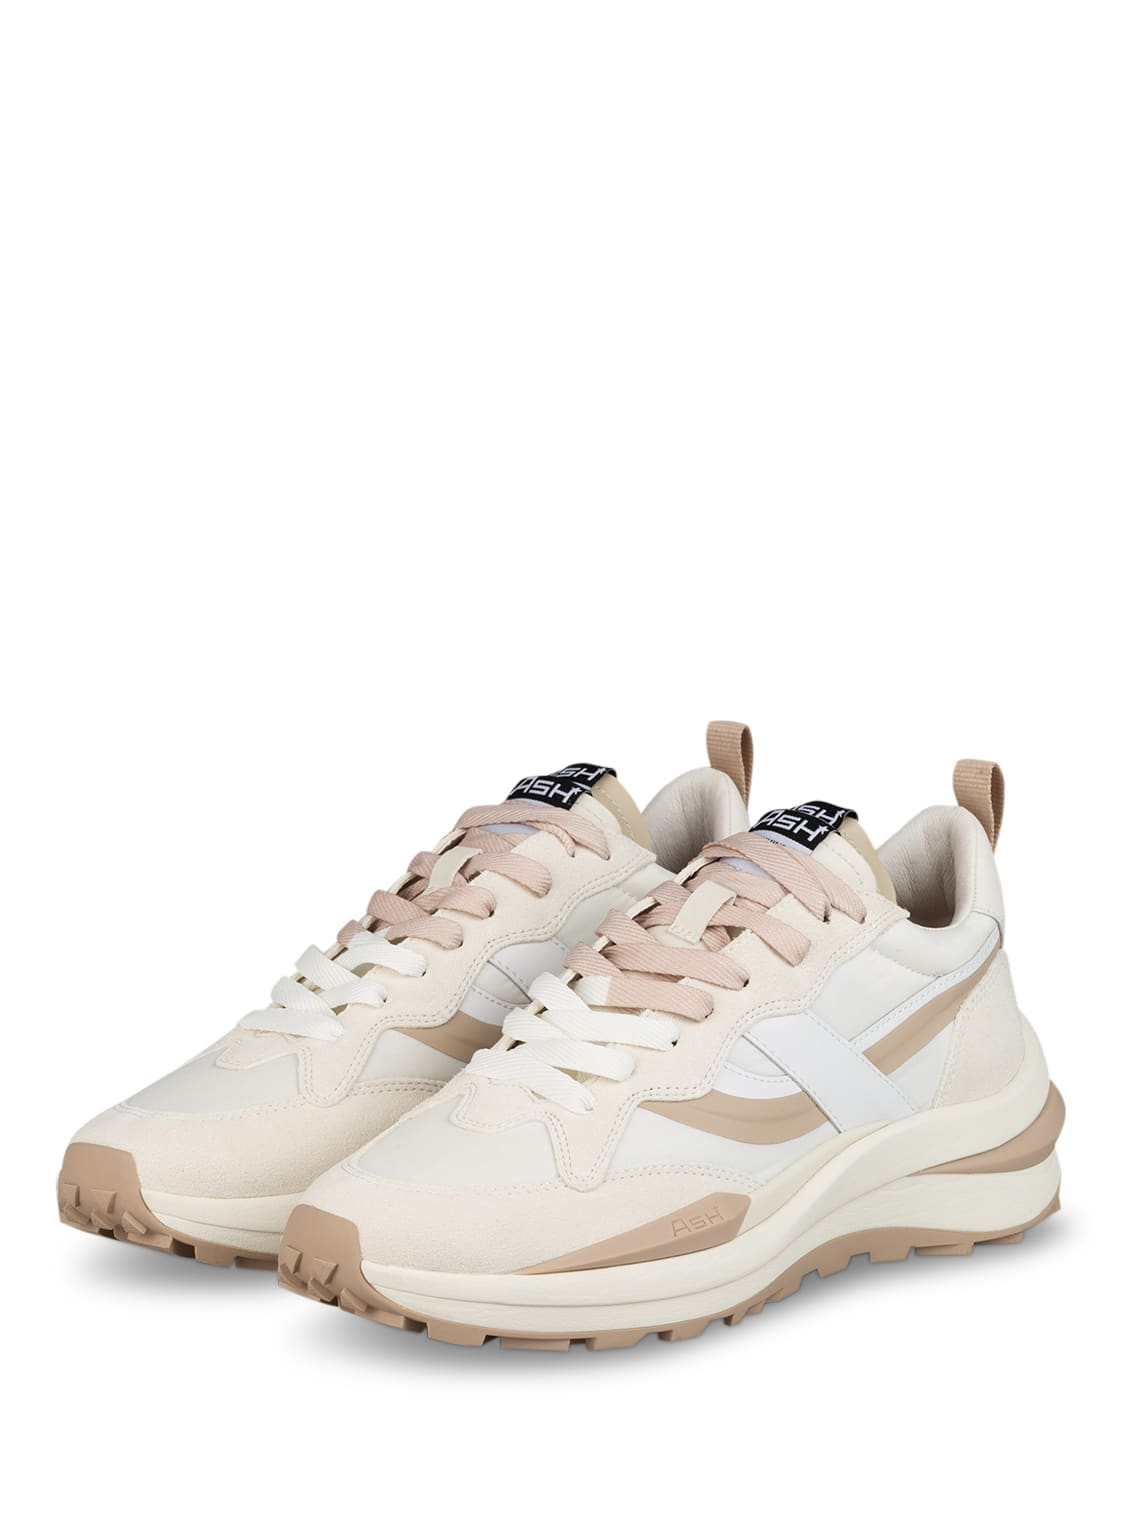 Image of Ash Plateau-Sneaker Spider beige